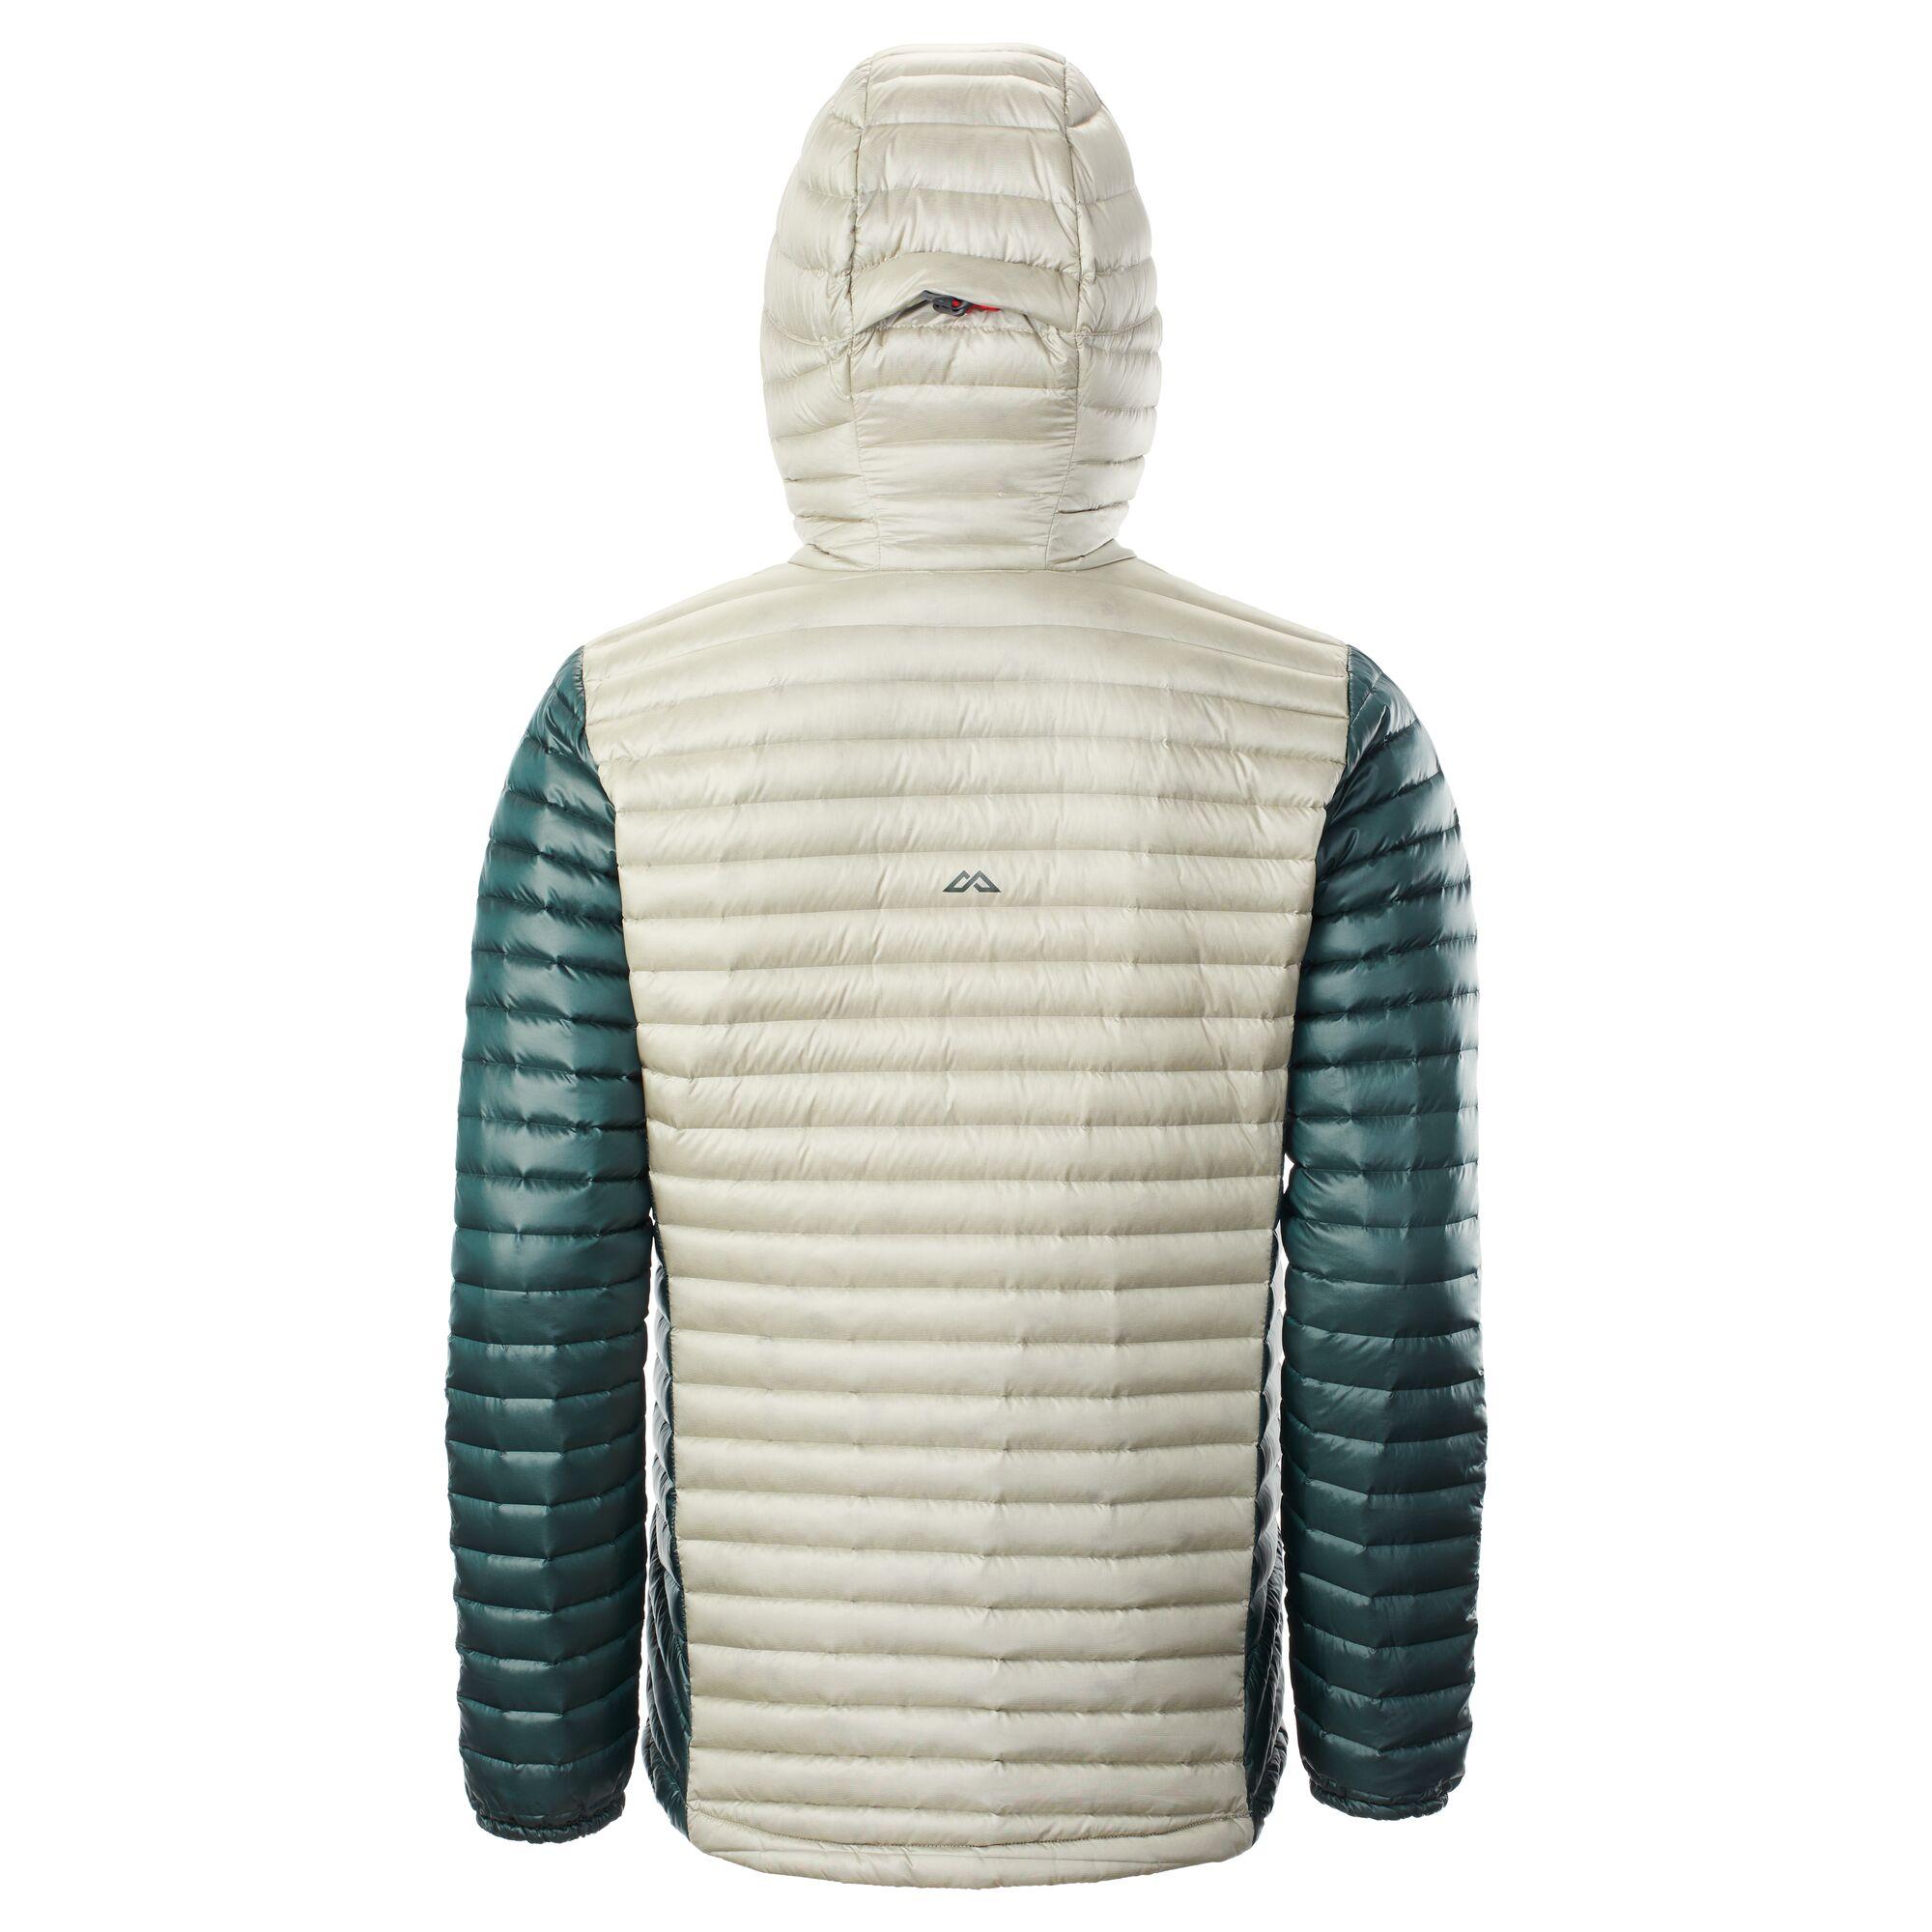 thumbnail 21 - NEW Kathmandu Flinders Lightweight Water-Repellent Warm Men's Down Puffer Jacket